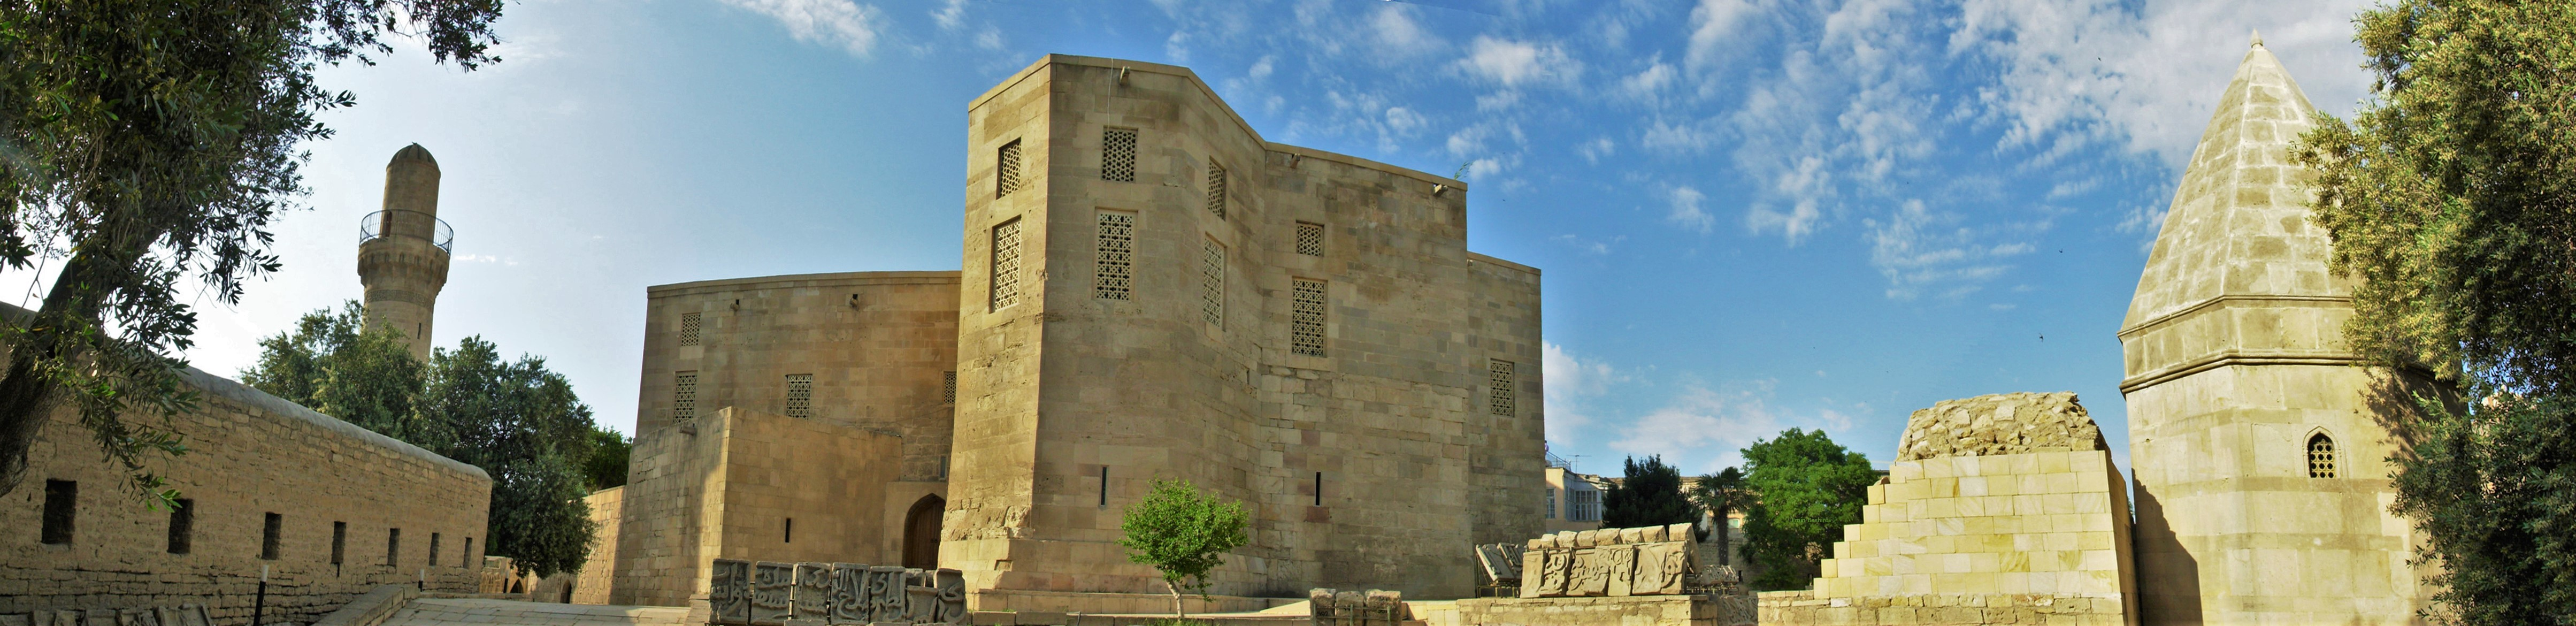 Shirvanshah Palace pano01.JPG